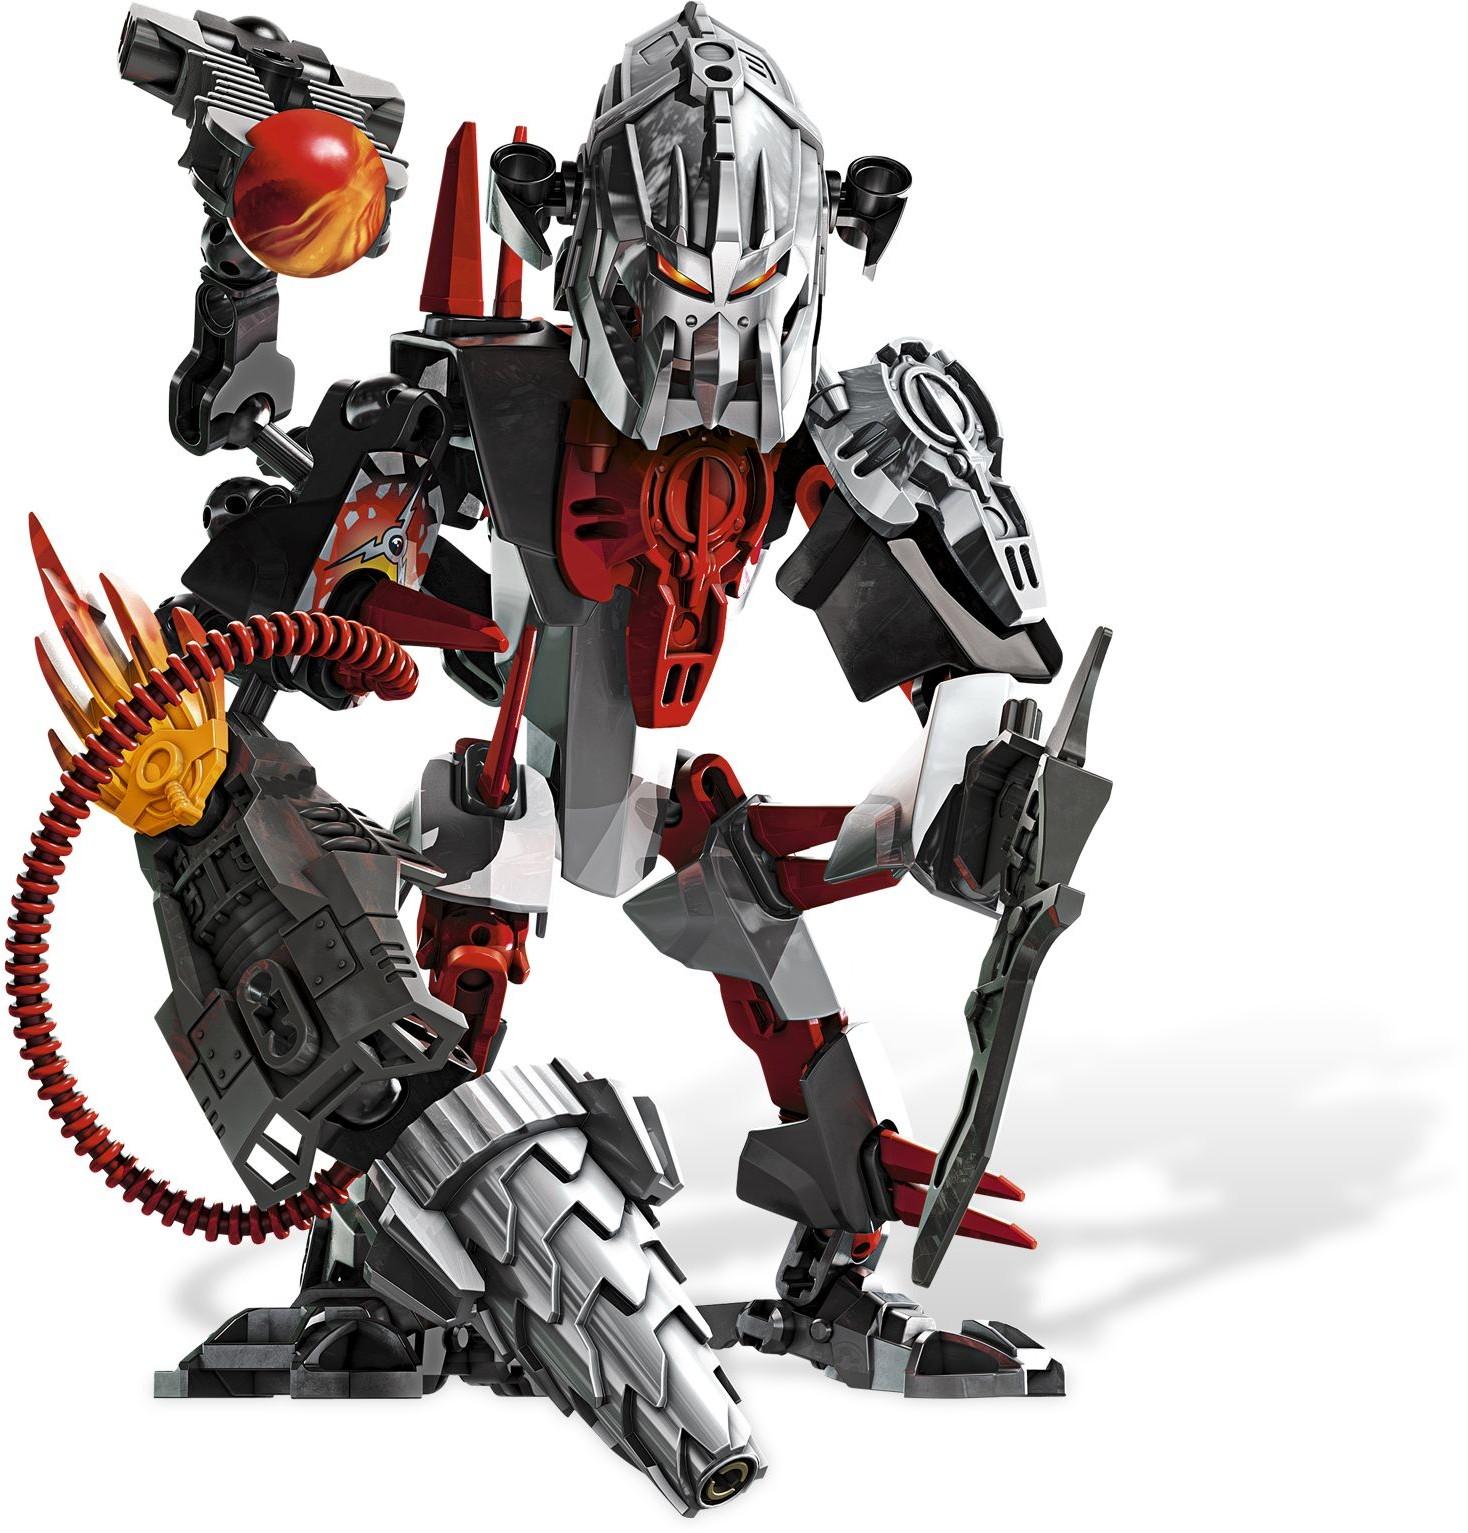 Tagged Hero Factory Villain Brickset Lego Set Guide And Database